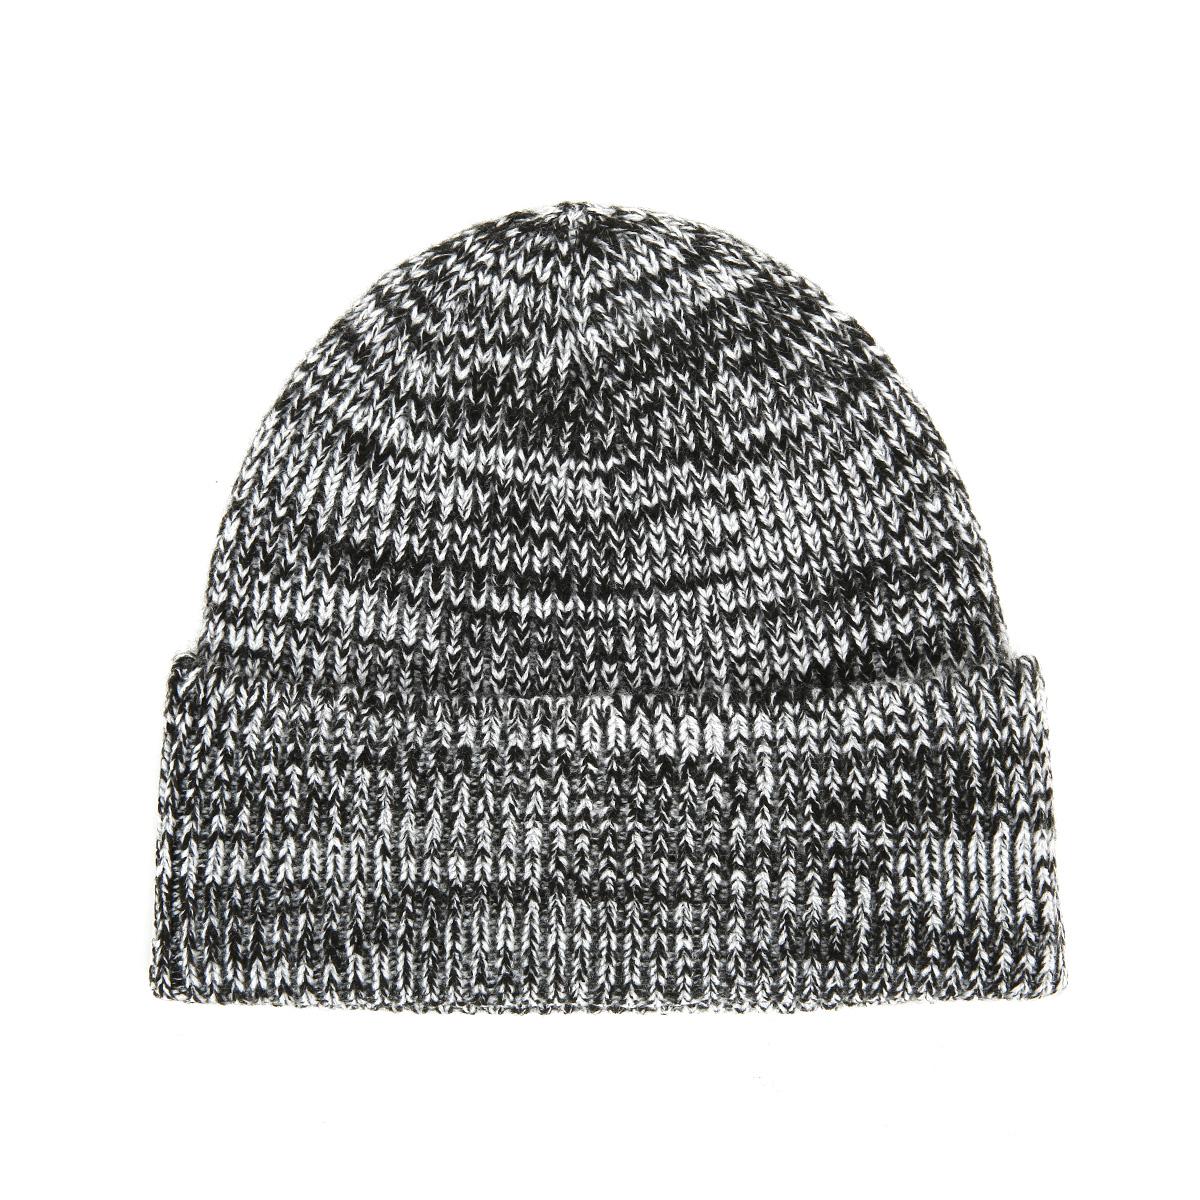 5cc912eb31165 Details about New Balance Black Watchmans Beanie Unisex Warm Winter Hat